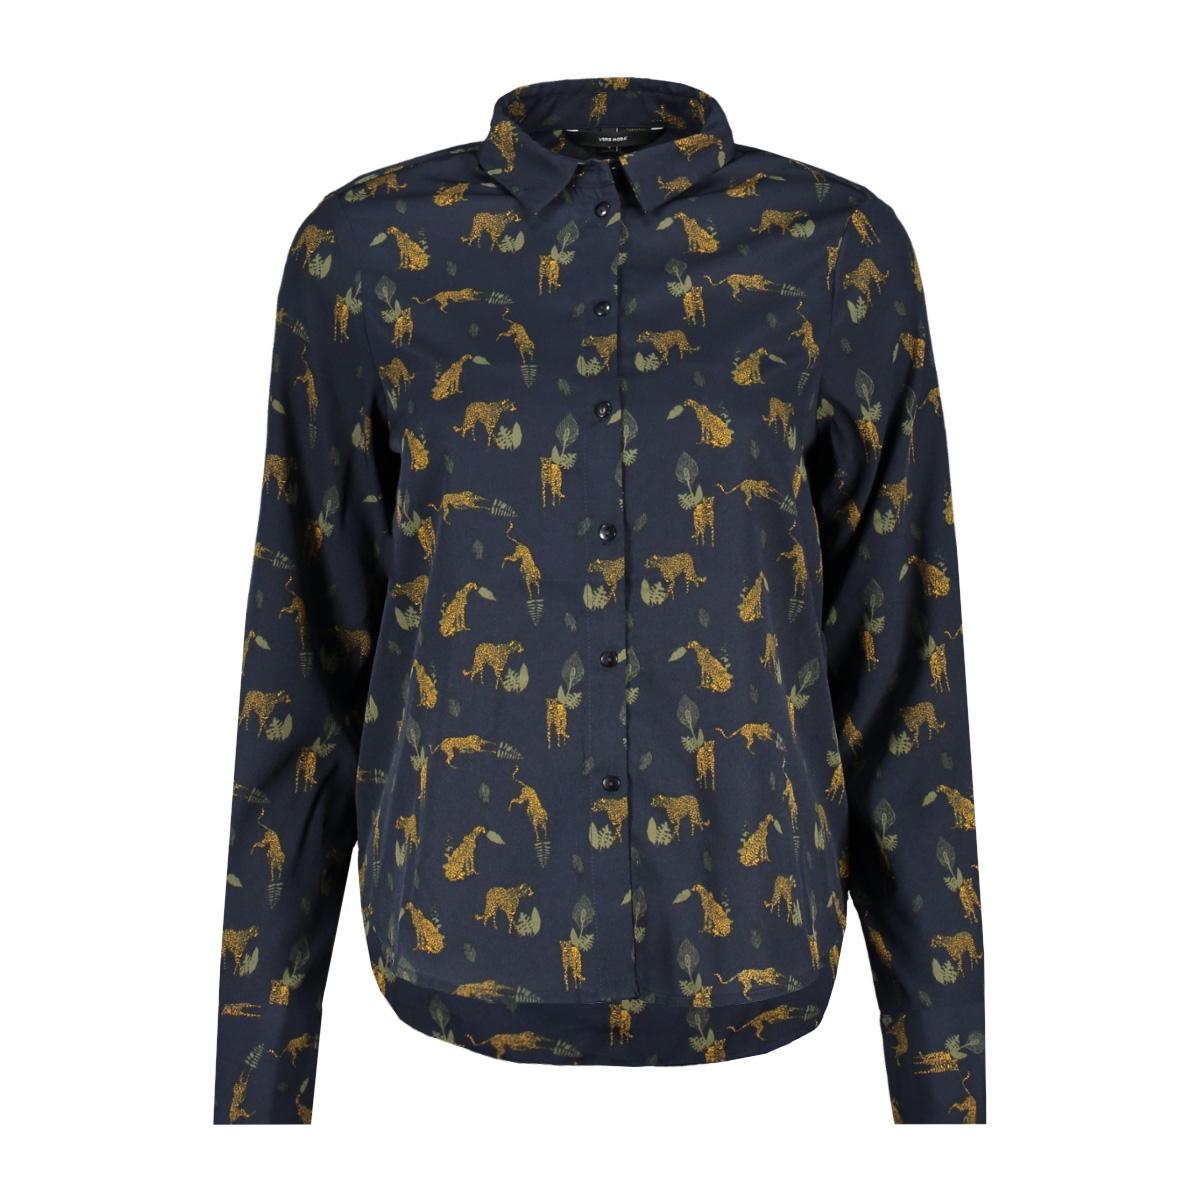 vmnicky l/s shirt d2-1 10193878 vero moda blouse night sky/leopard an